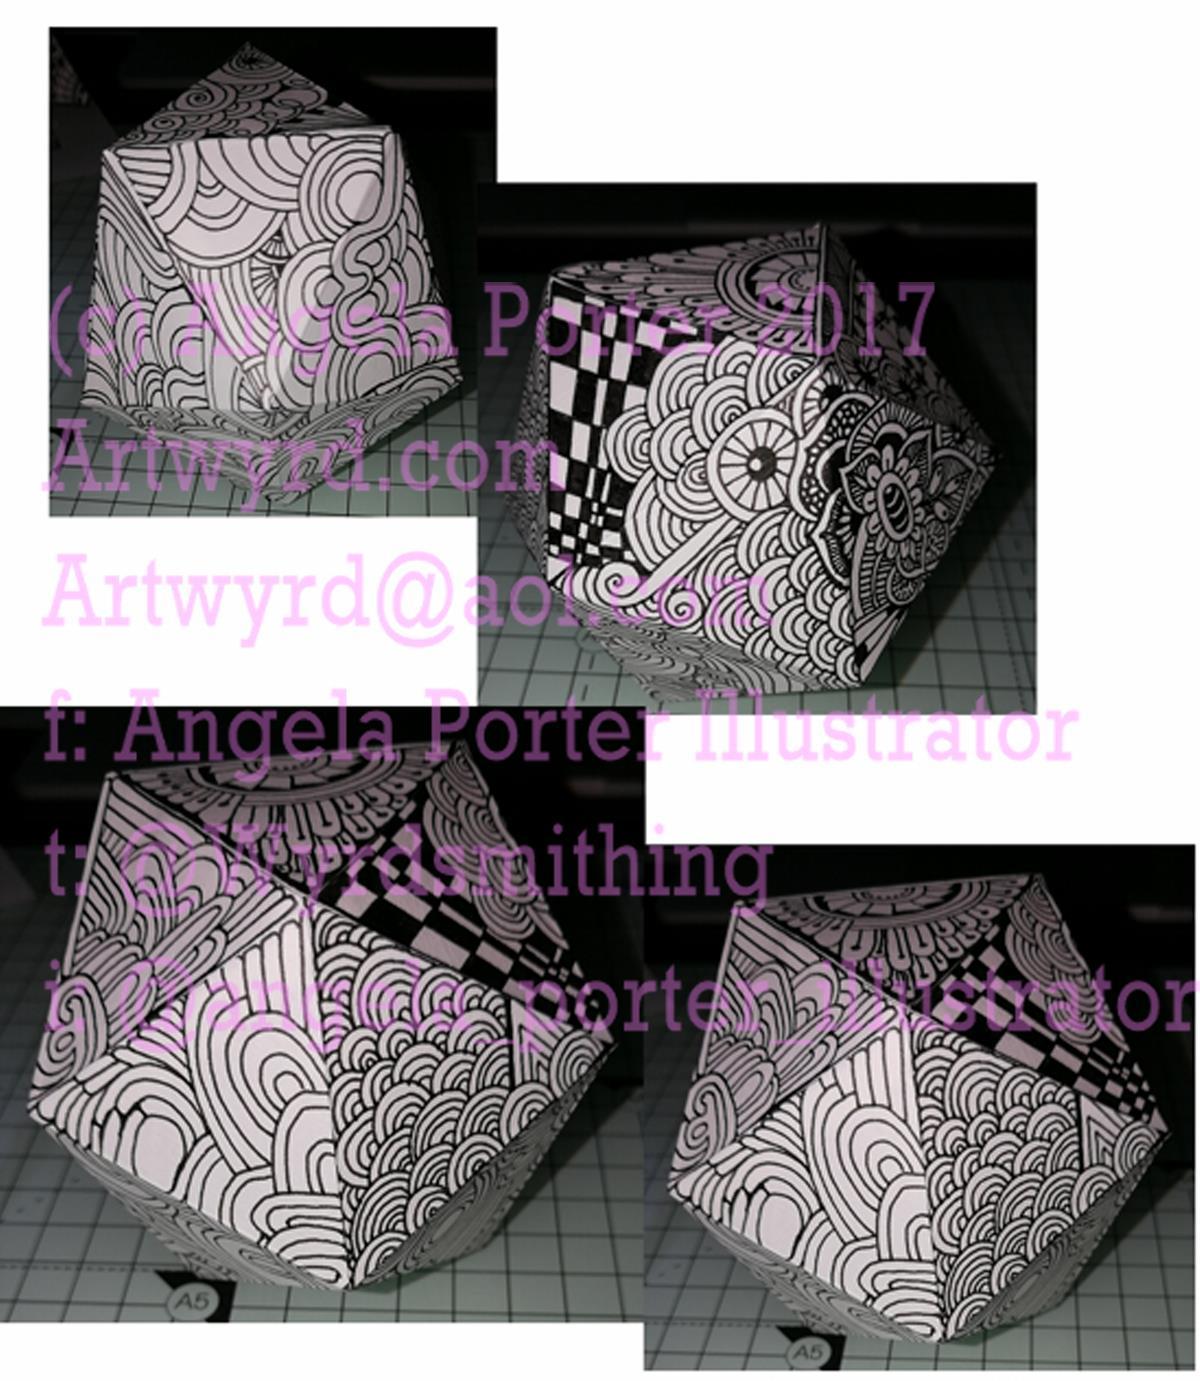 Icosohedron1 montage Angela Porter 19 Sept 2017